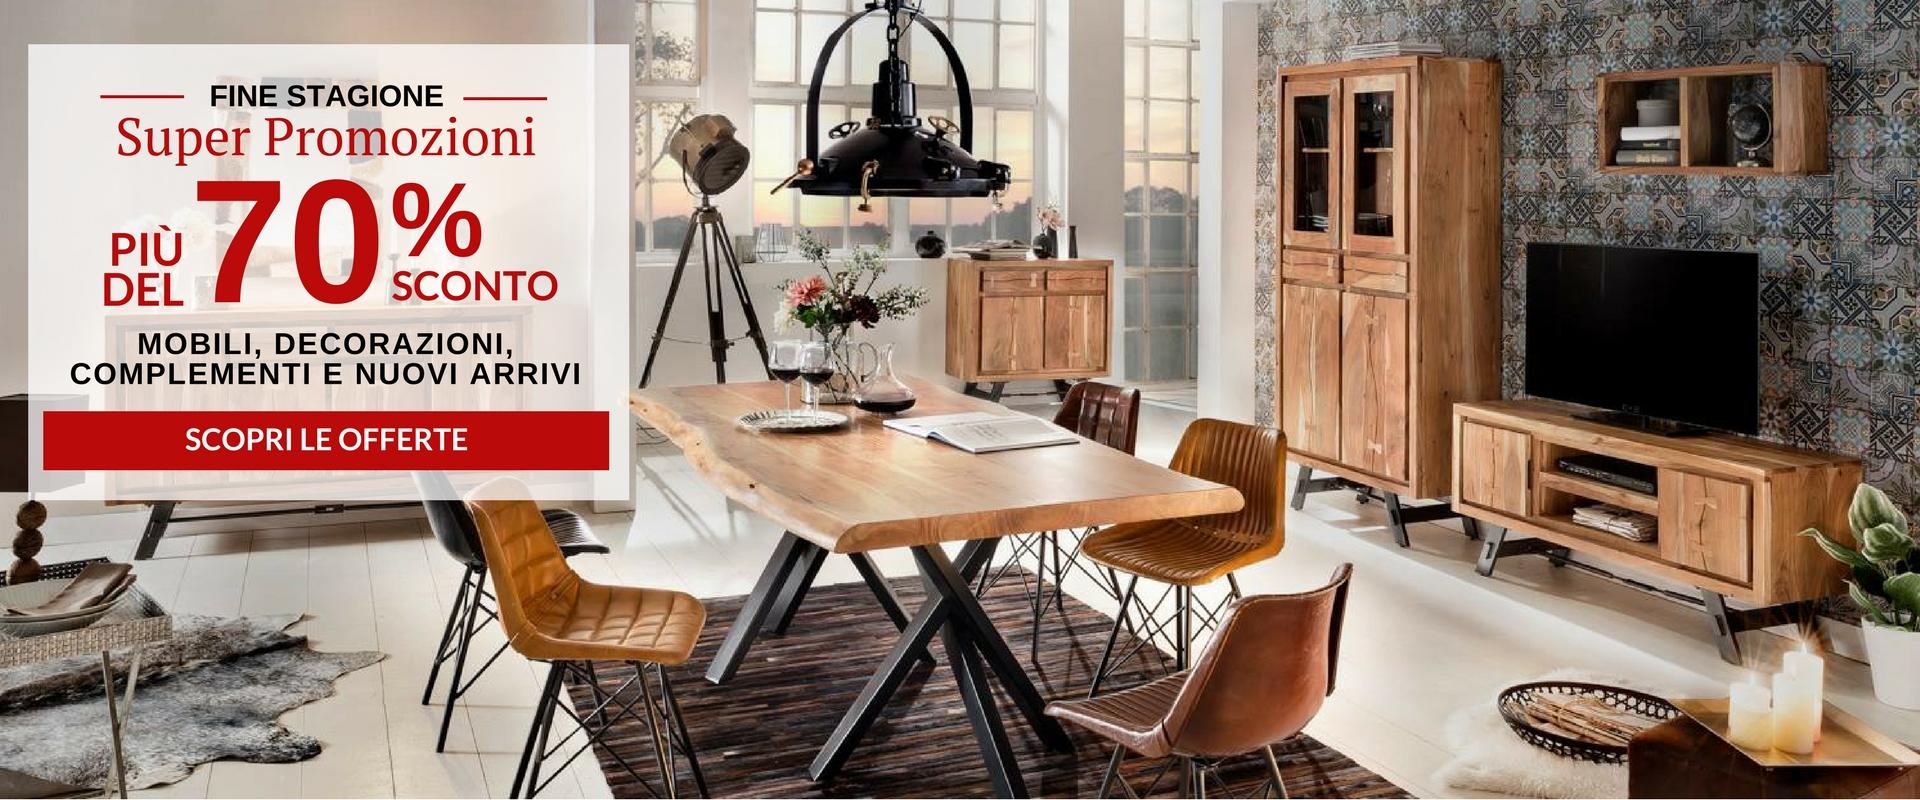 Mobili etnici industrial e vintage vendita online con for Mobili vendita online offerte